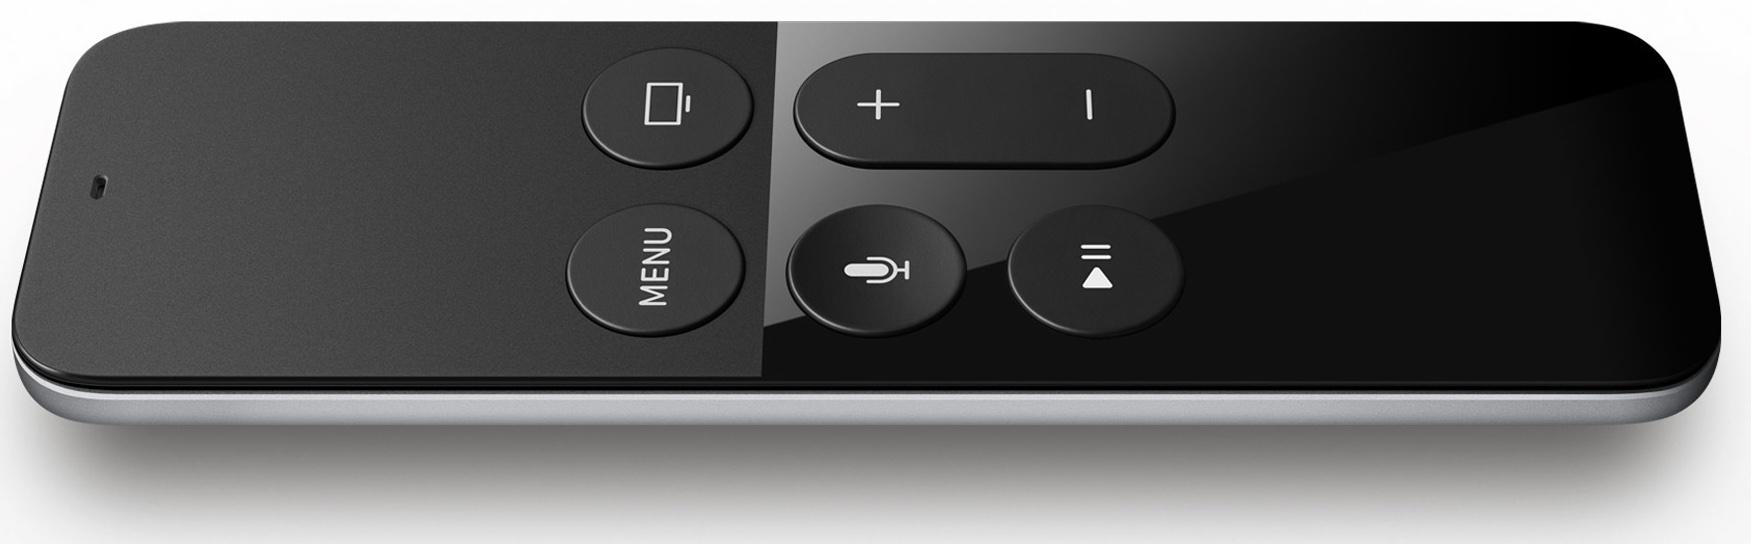 Apple TV 4 remote image 001